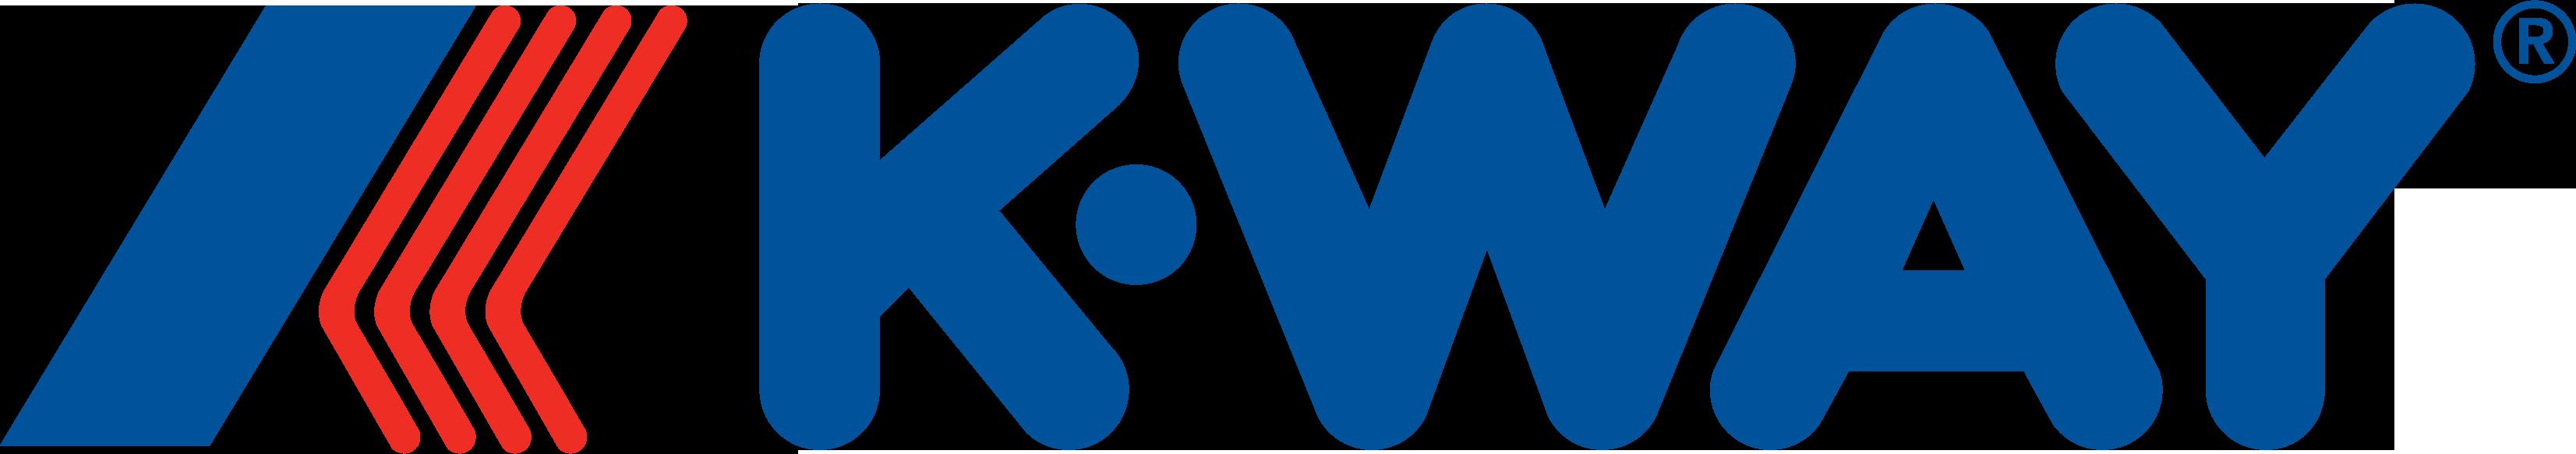 K-Way_logo autumn winter menswear